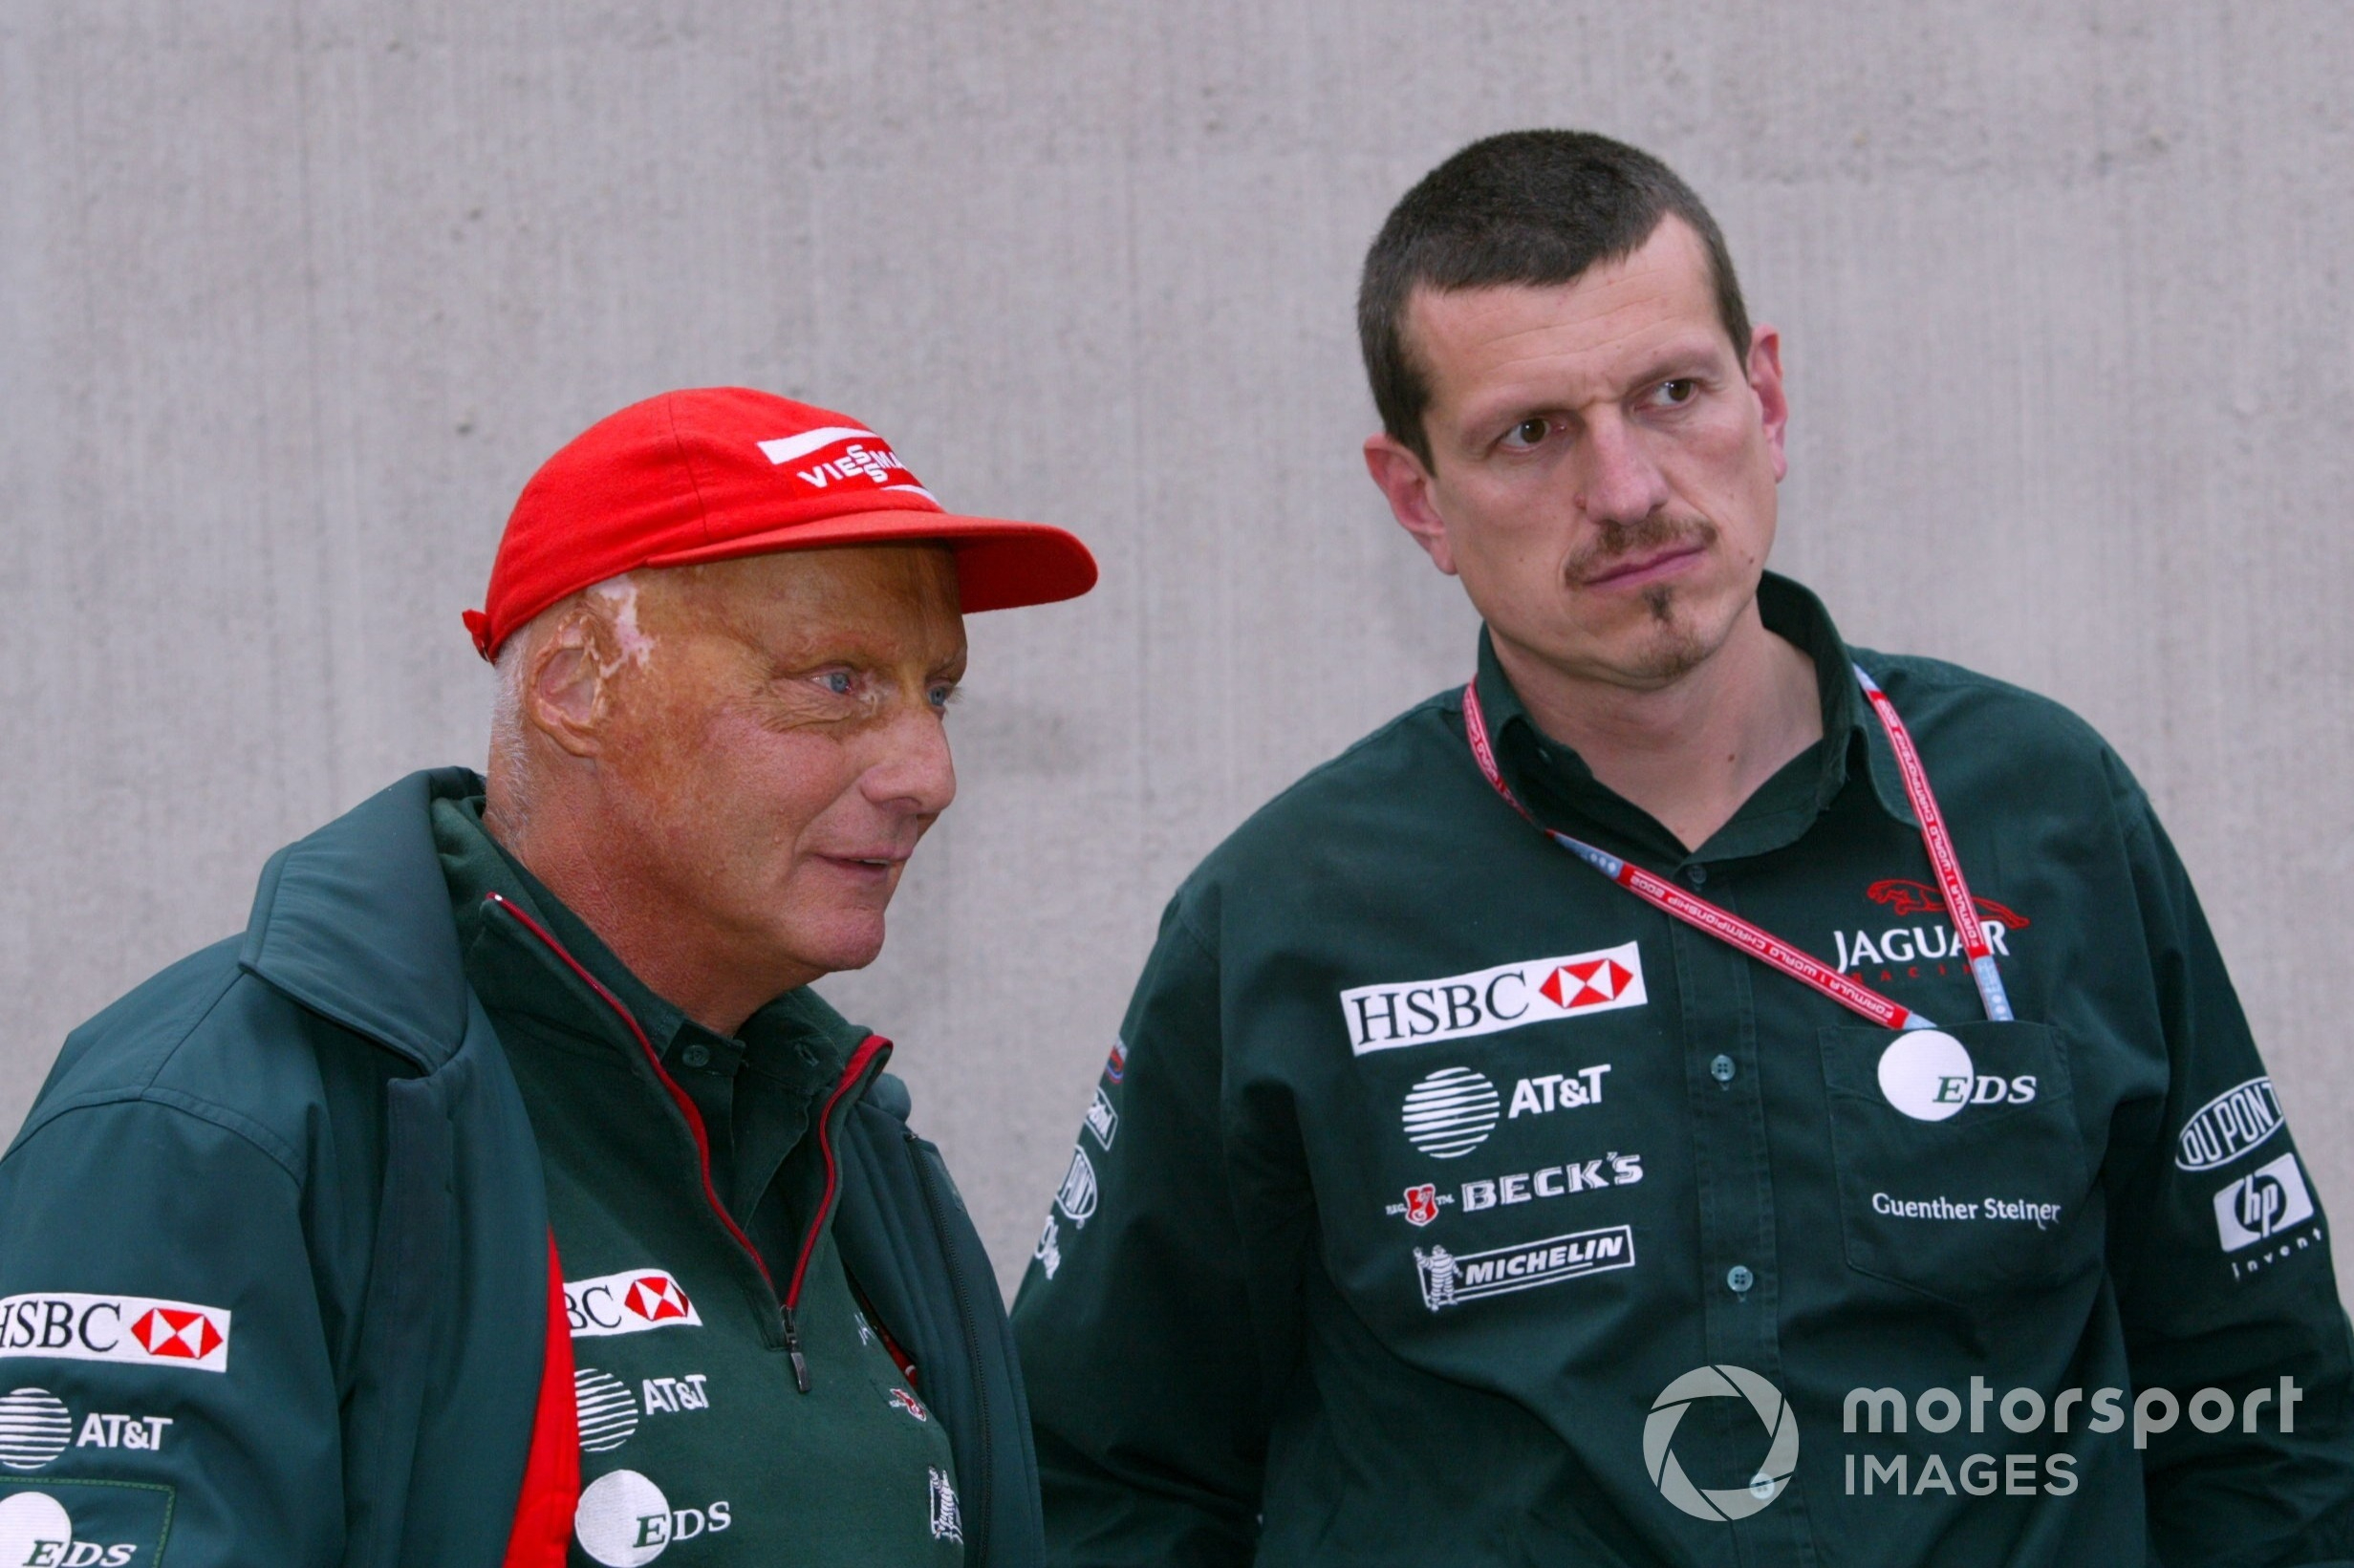 Niki Lauda Jaguar Team Principal with Gunther Steiner Jaguar Technical Director, 2002 United States Grand Prix